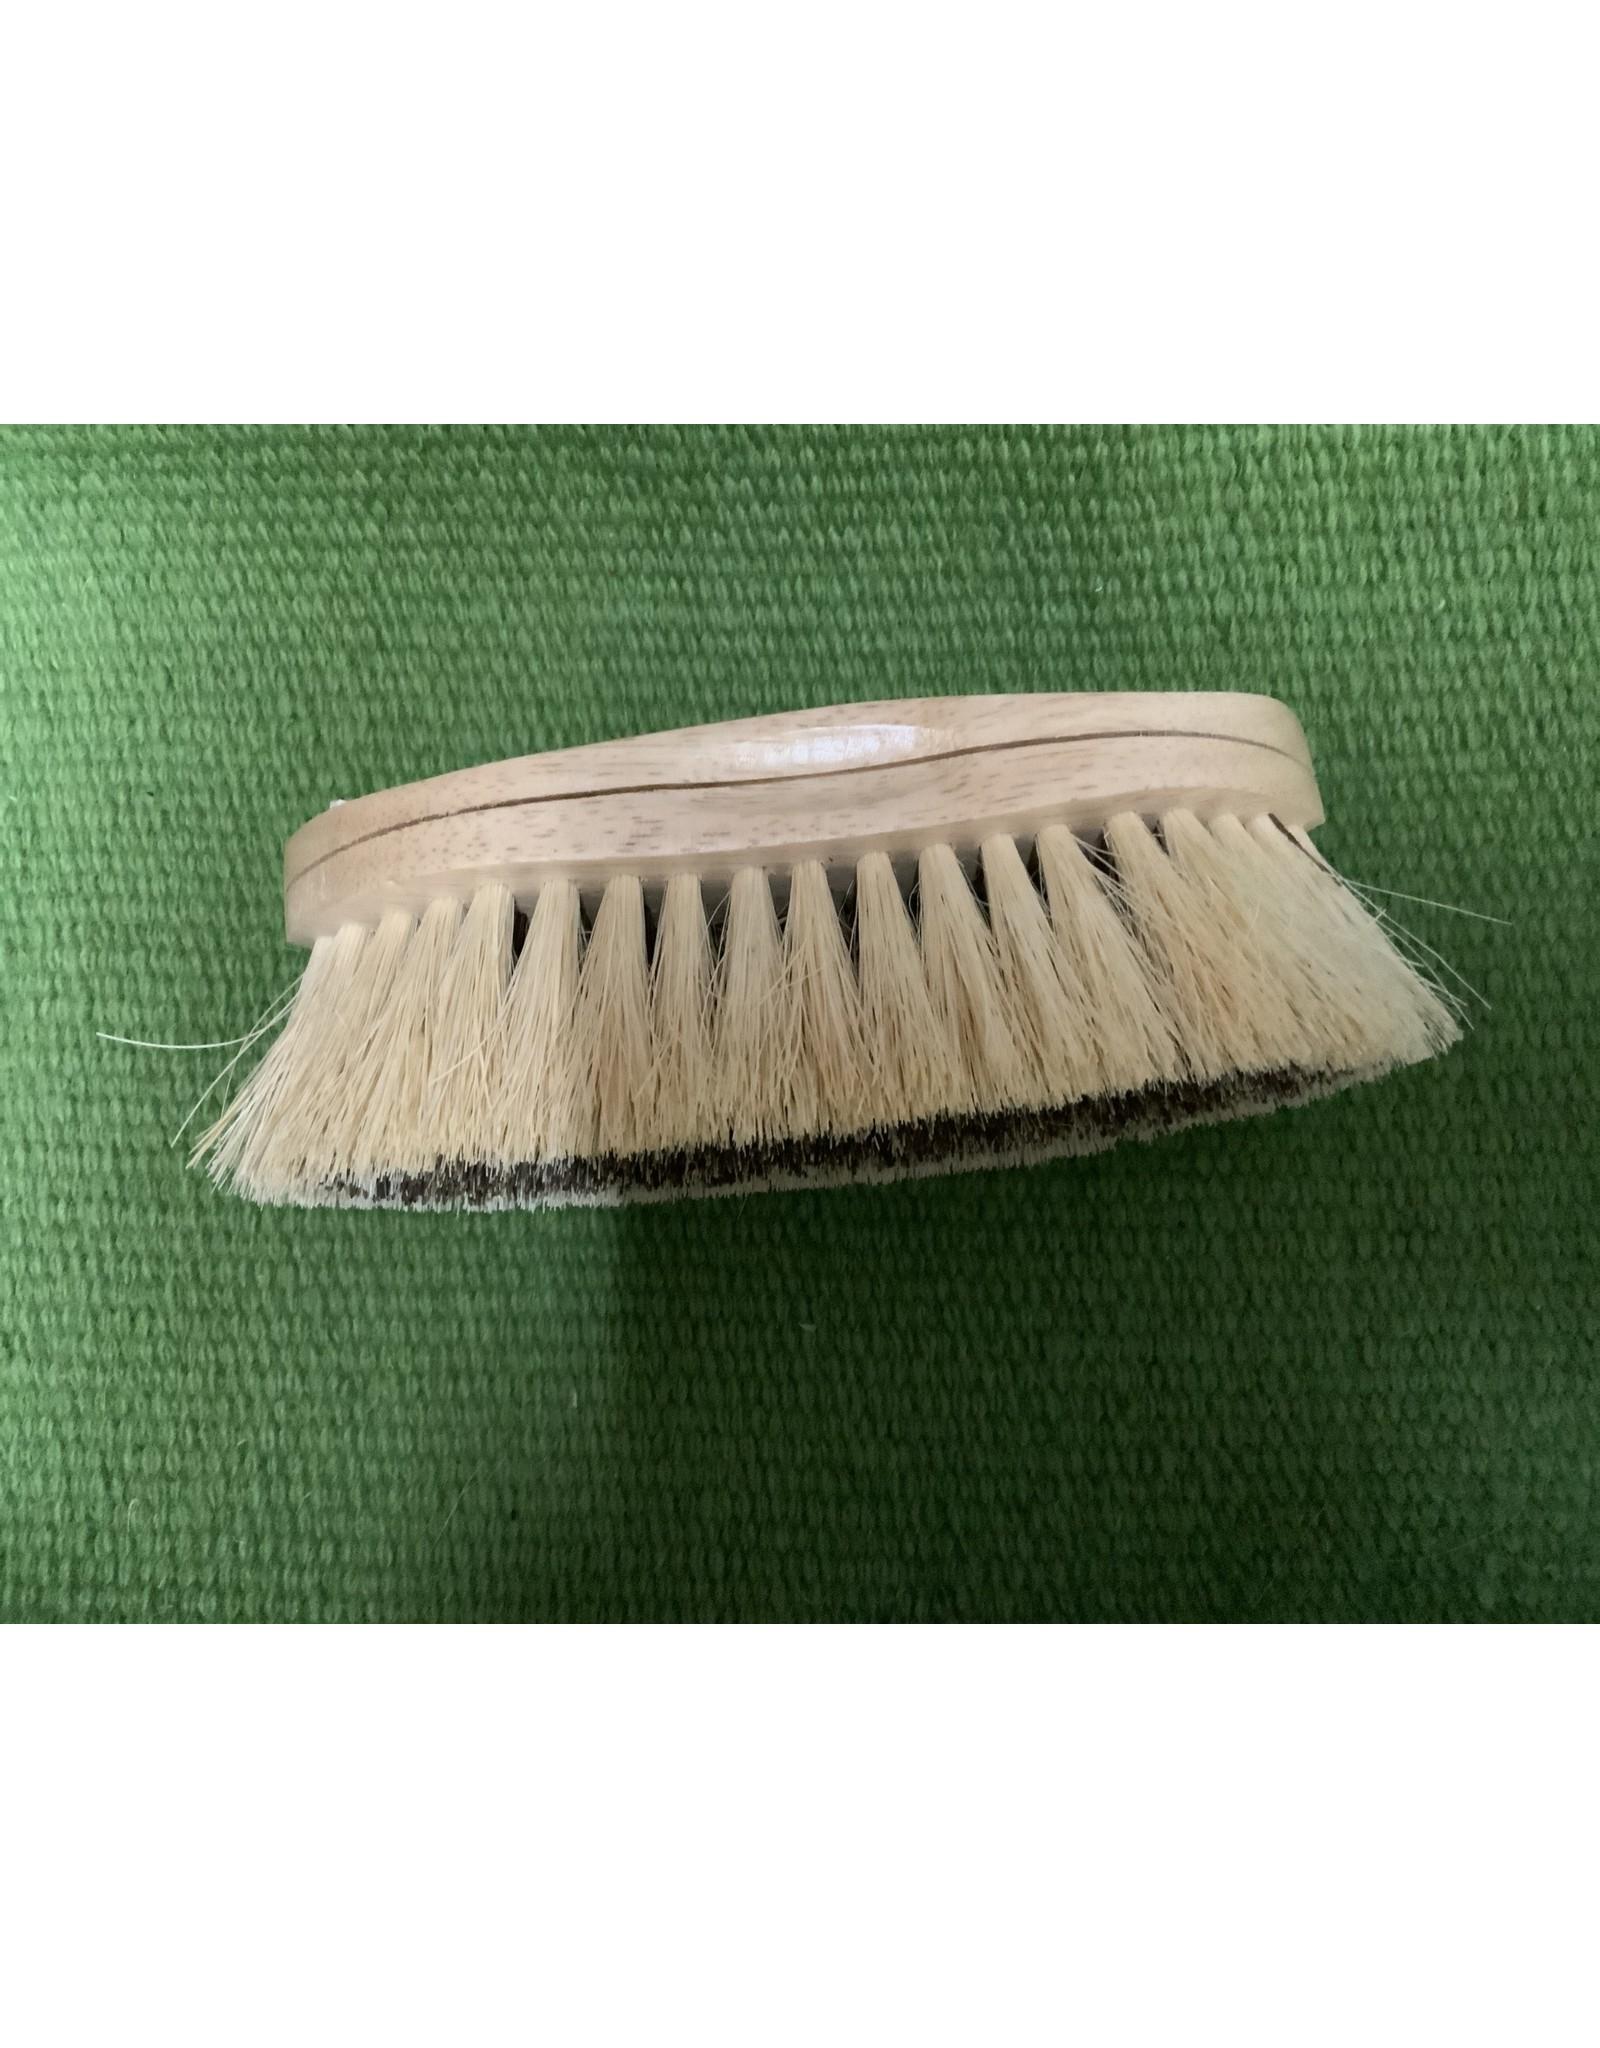 Brush Grooming - Natural Caliente